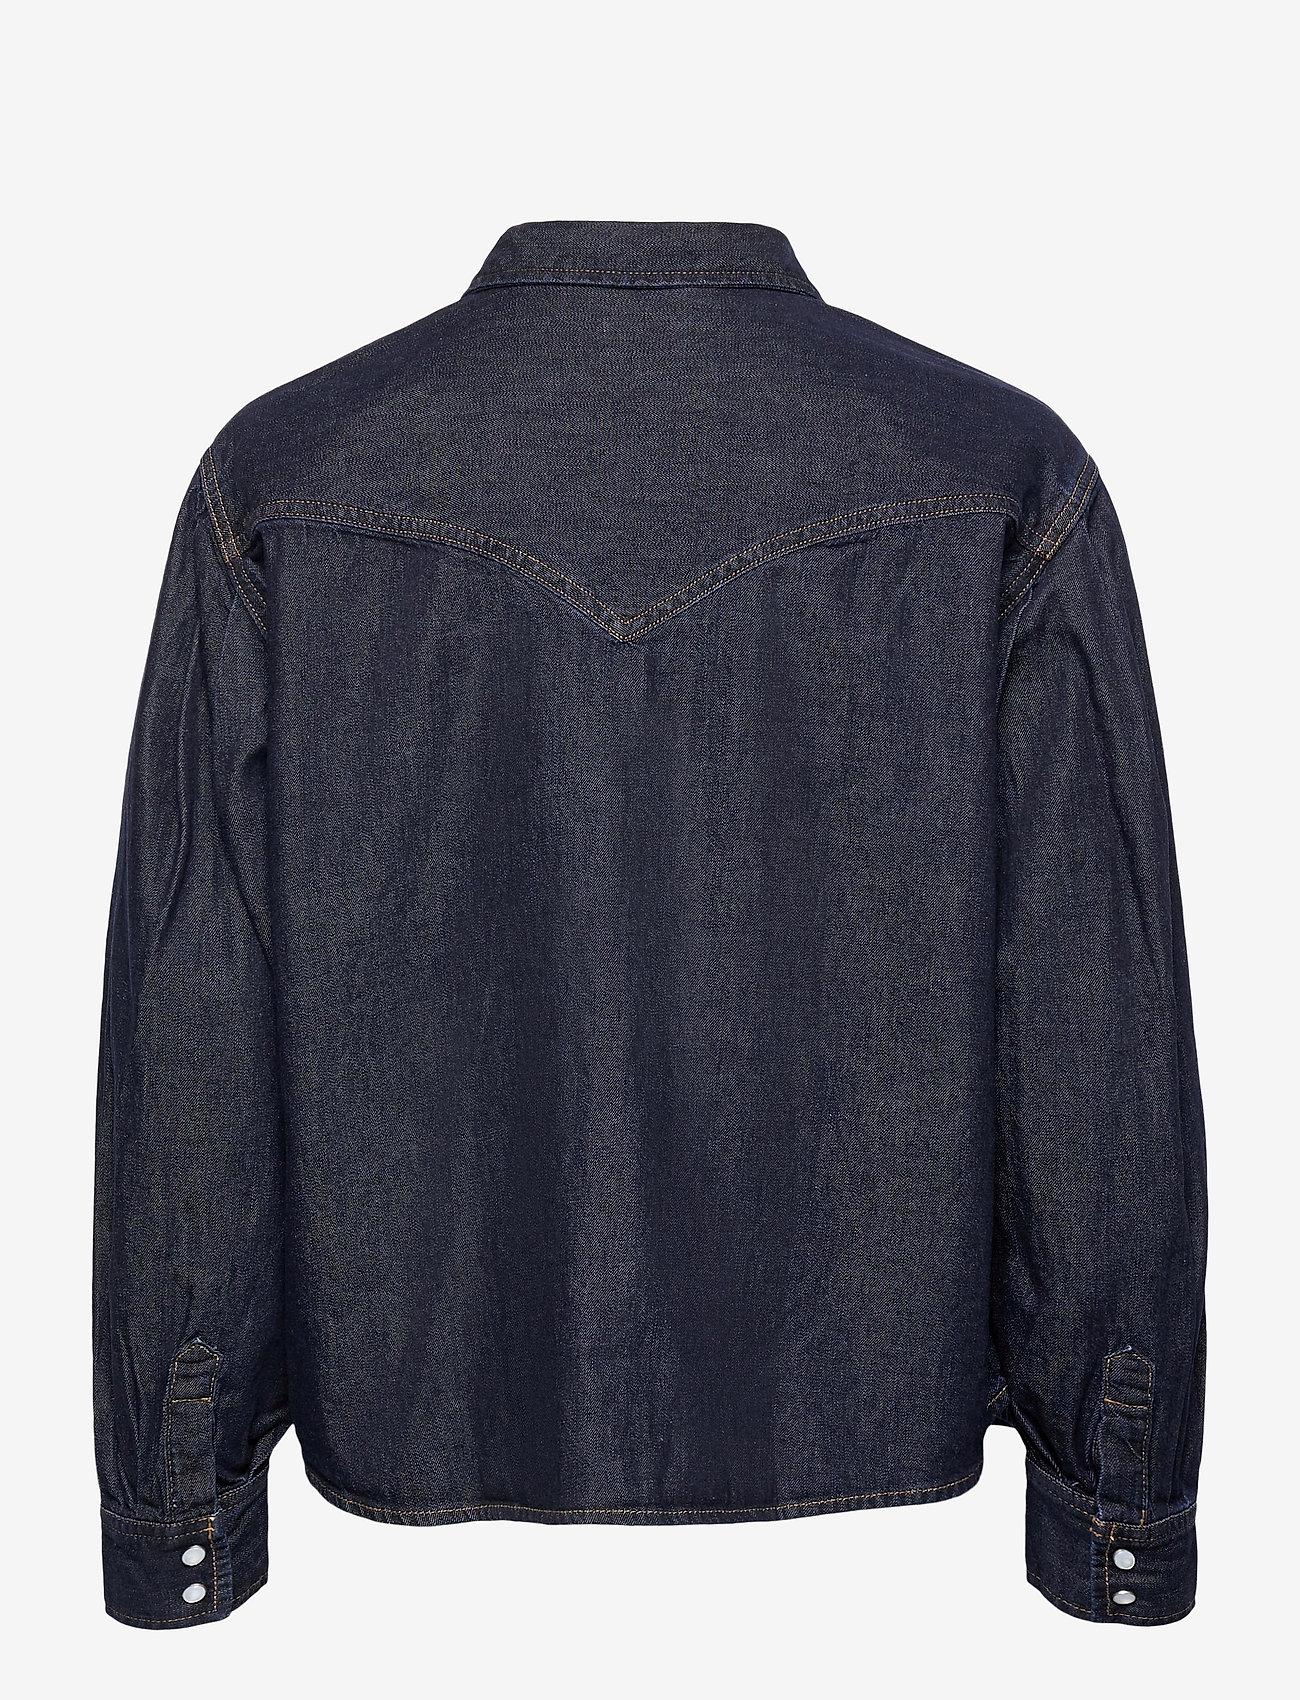 LEVI´S Women - PAYTON LS WESTERN TONGUE TWIST - jeansblouses - dark indigo - flat finish - 1